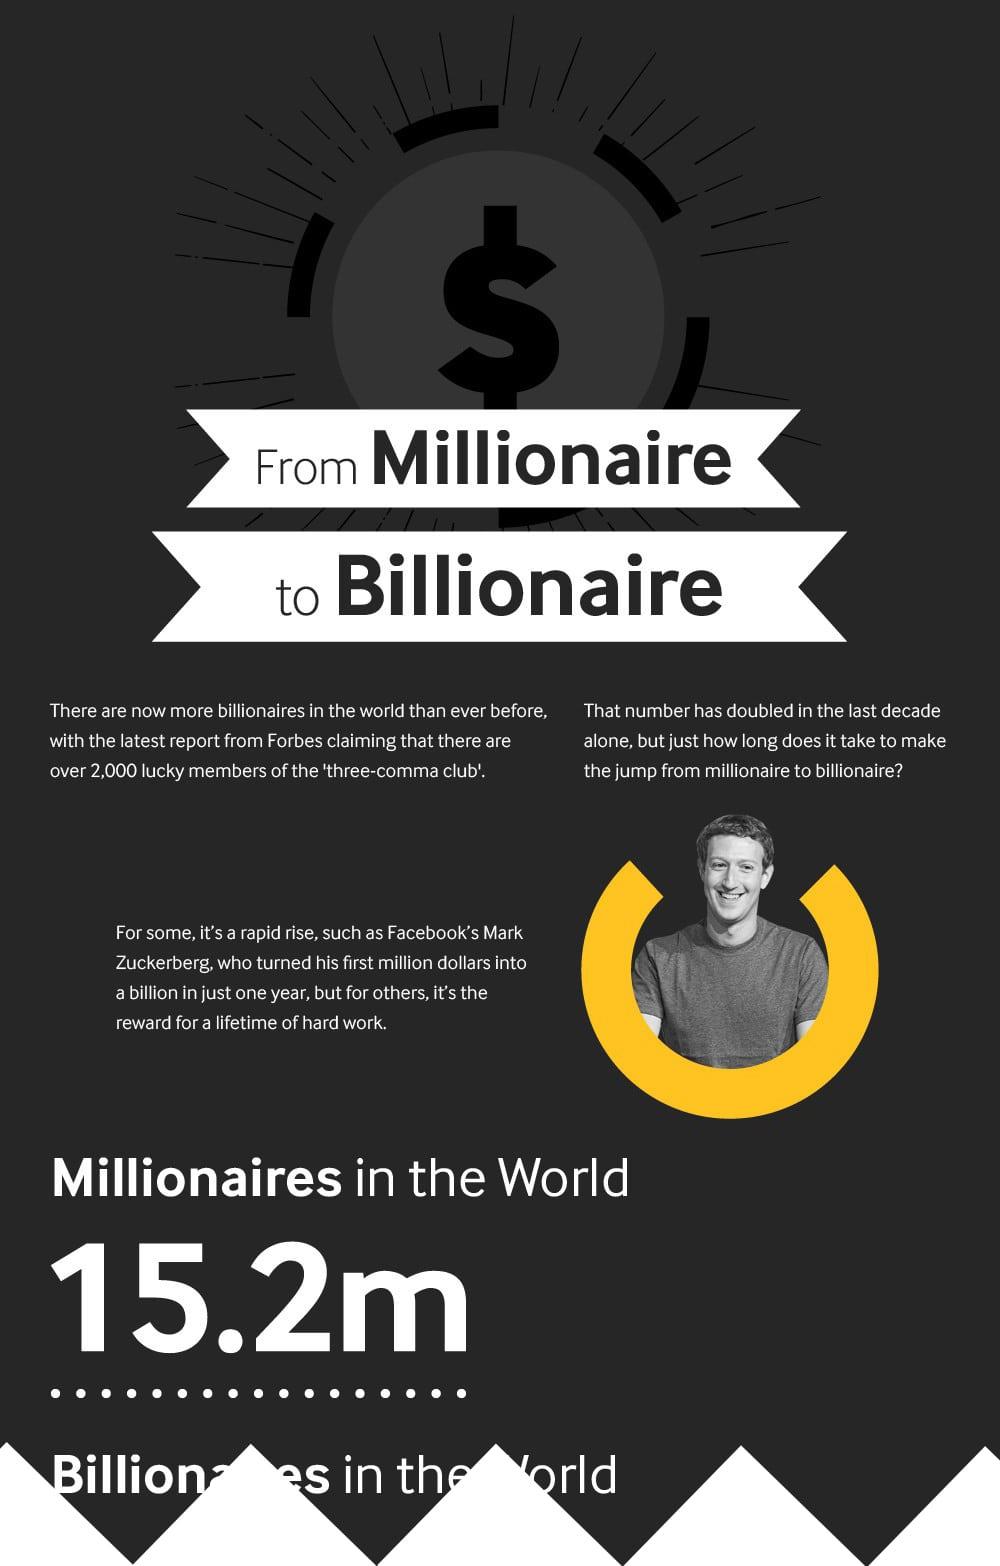 millionaire to billionaire infographic